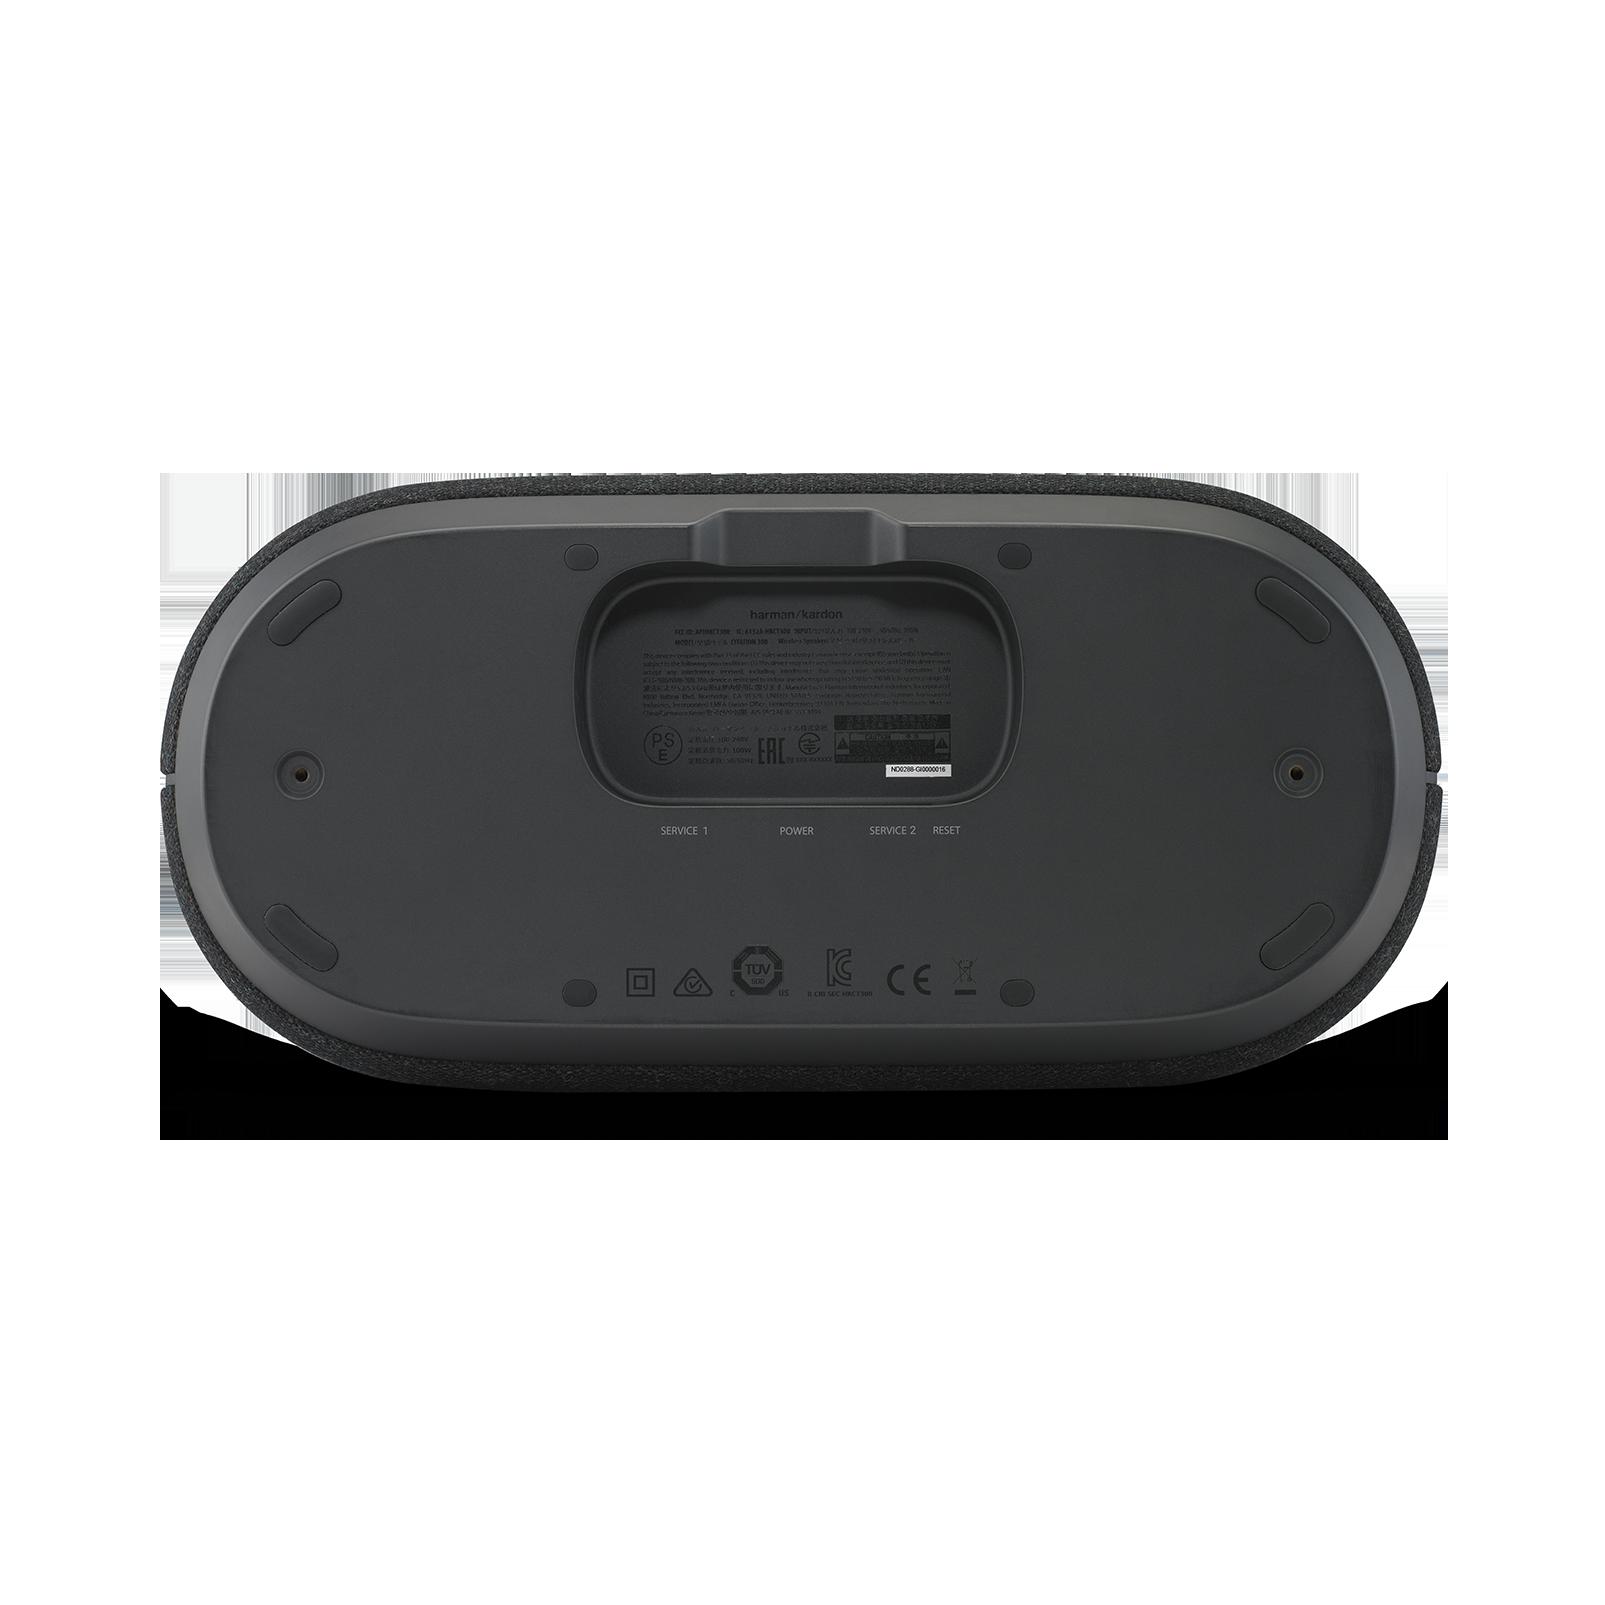 Harman Kardon Citation 300 - Black - The medium-size smart home speaker with award winning design - Detailshot 2